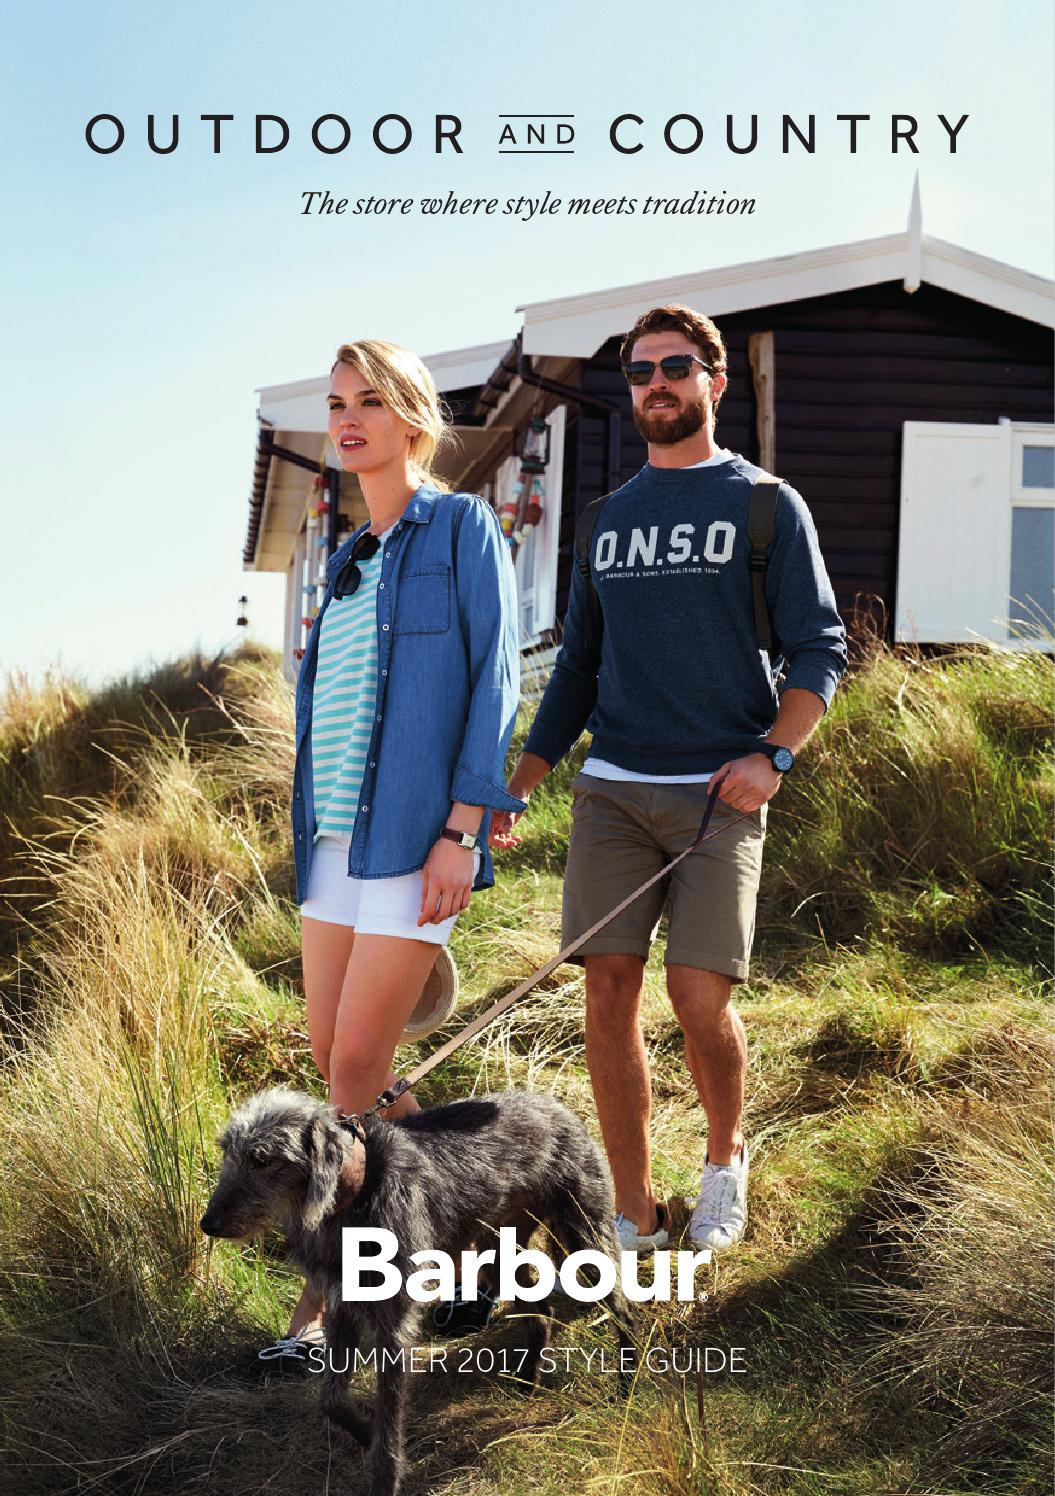 barbour summer